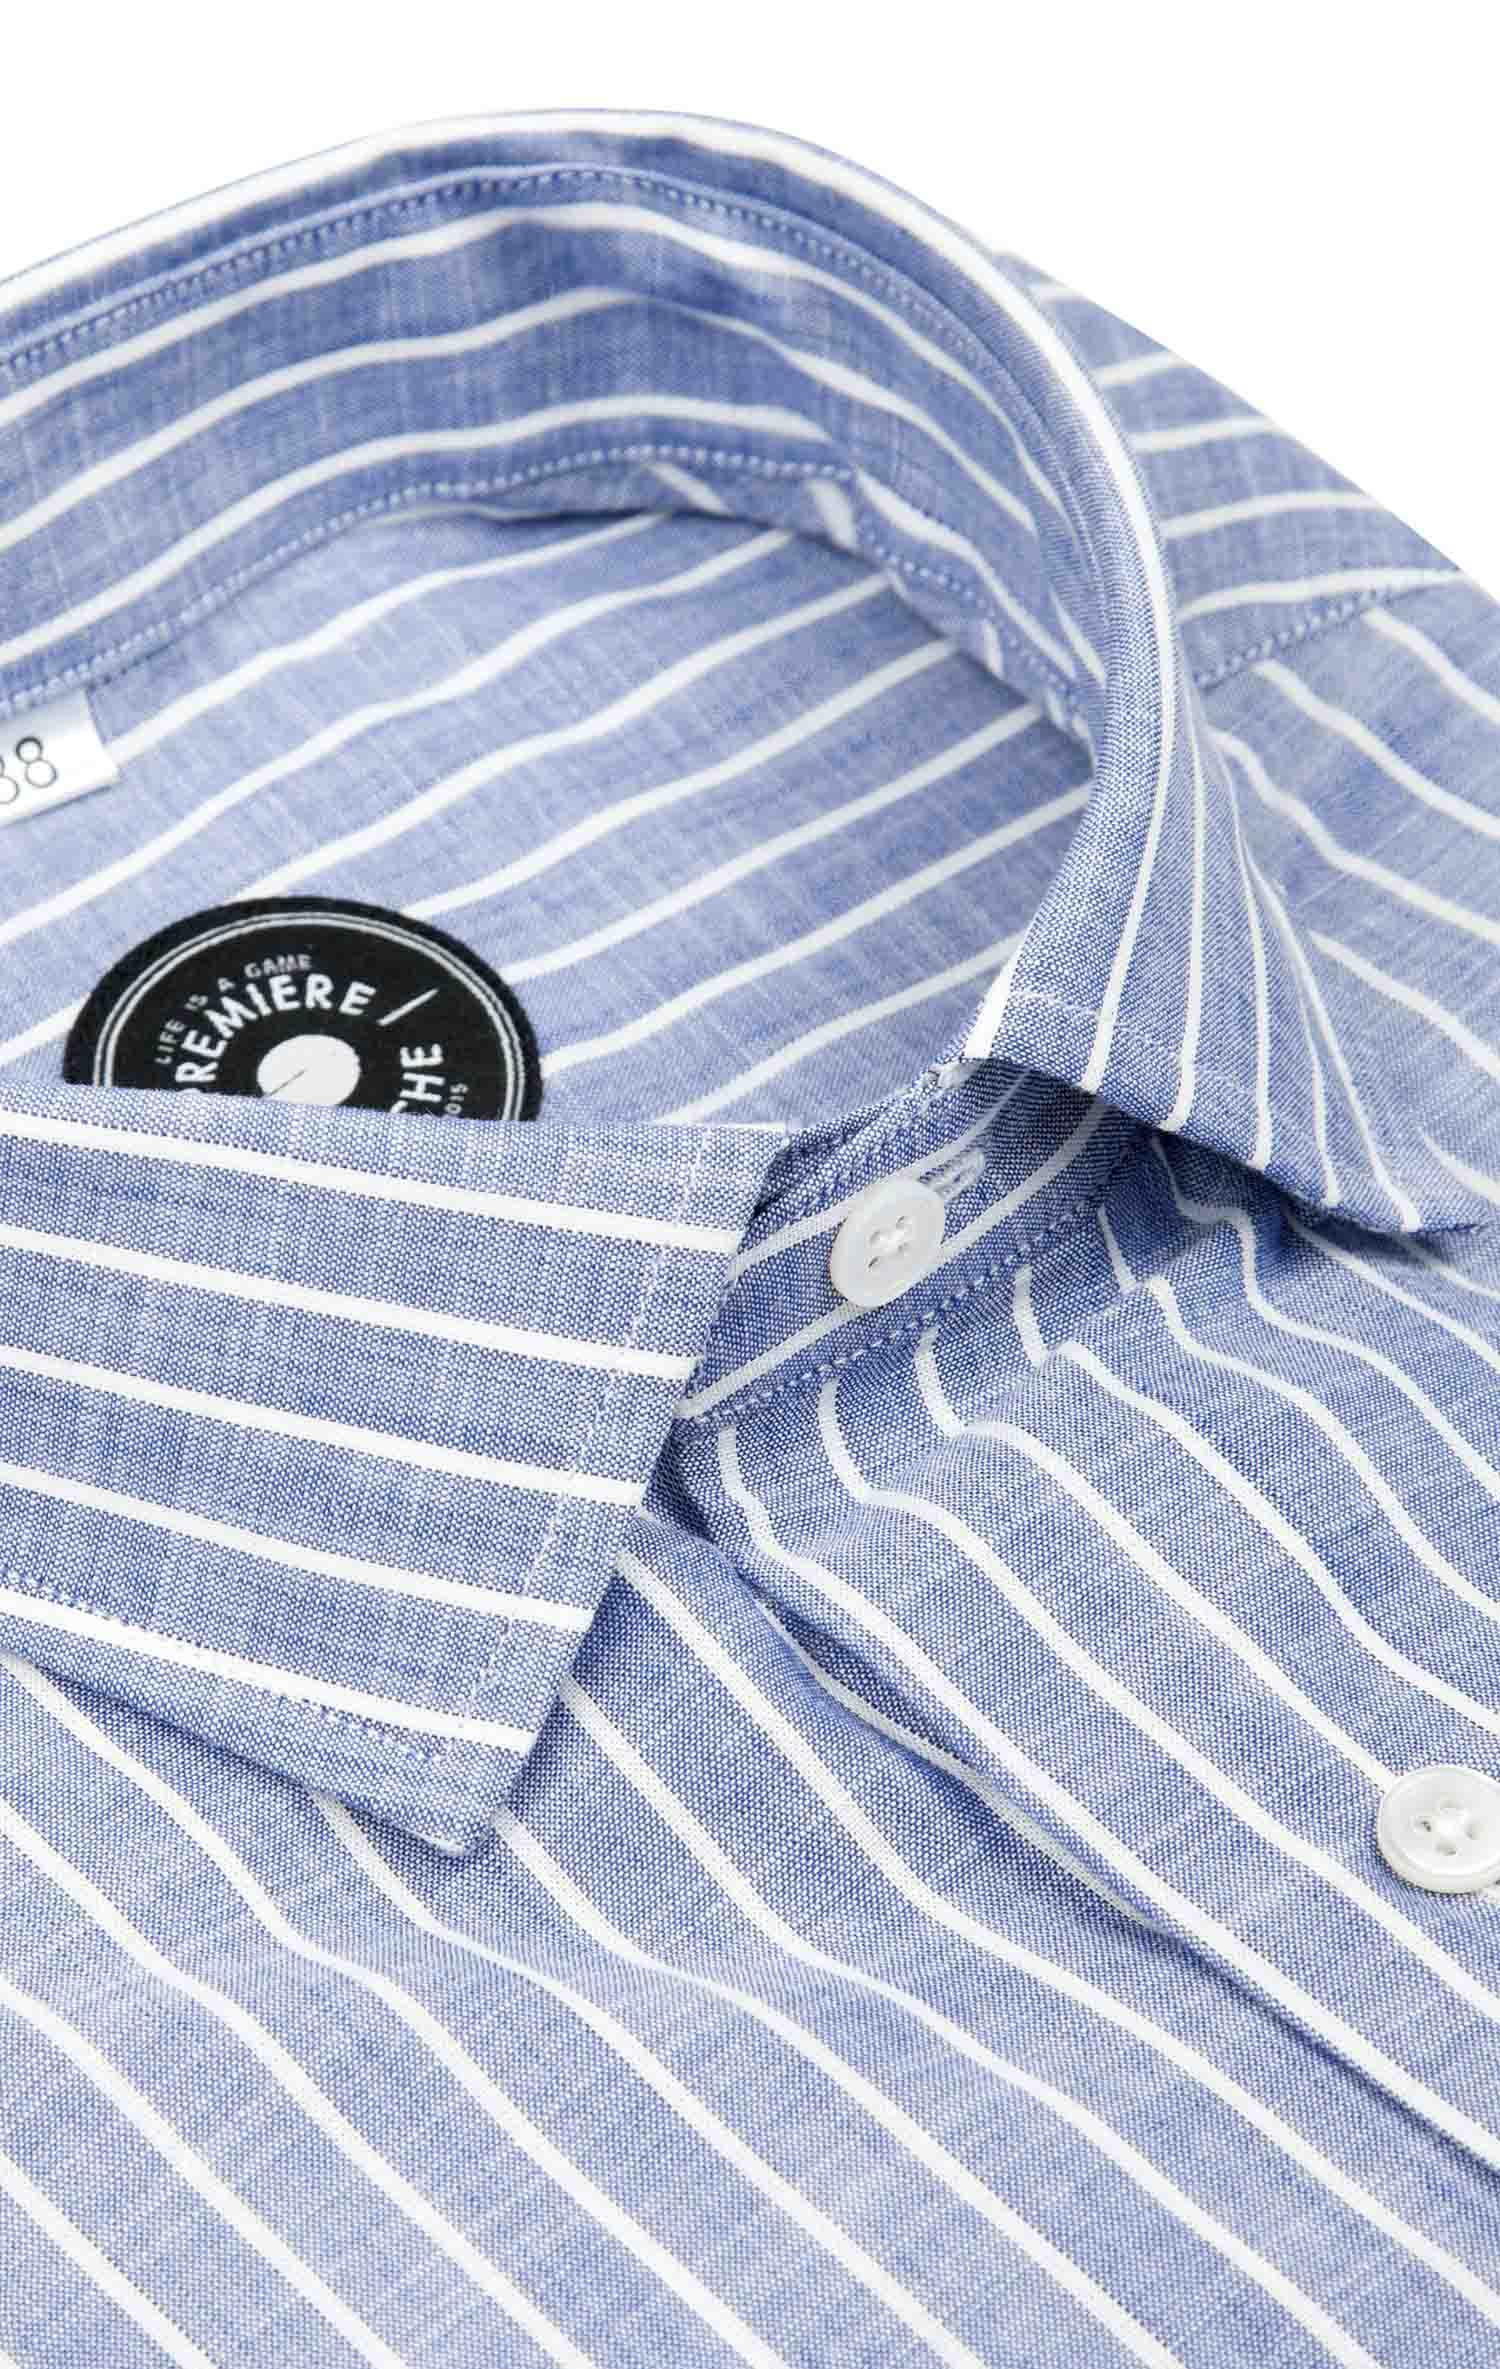 Chemise chambray rayée Les chemises